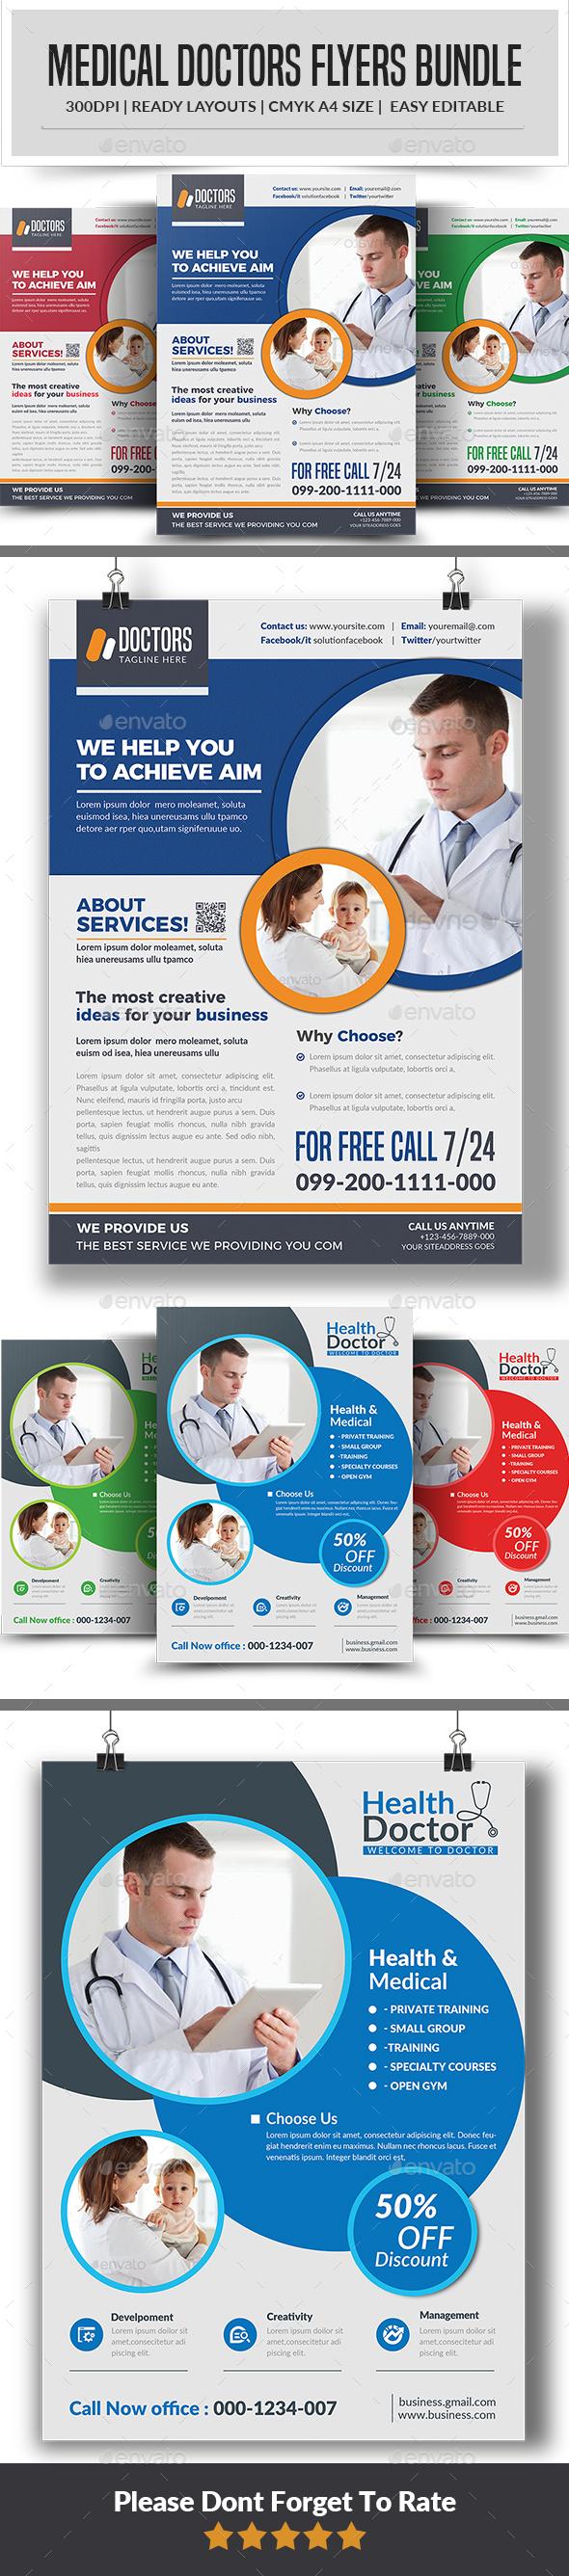 Doctors Flyers Bundle template - Corporate Flyers